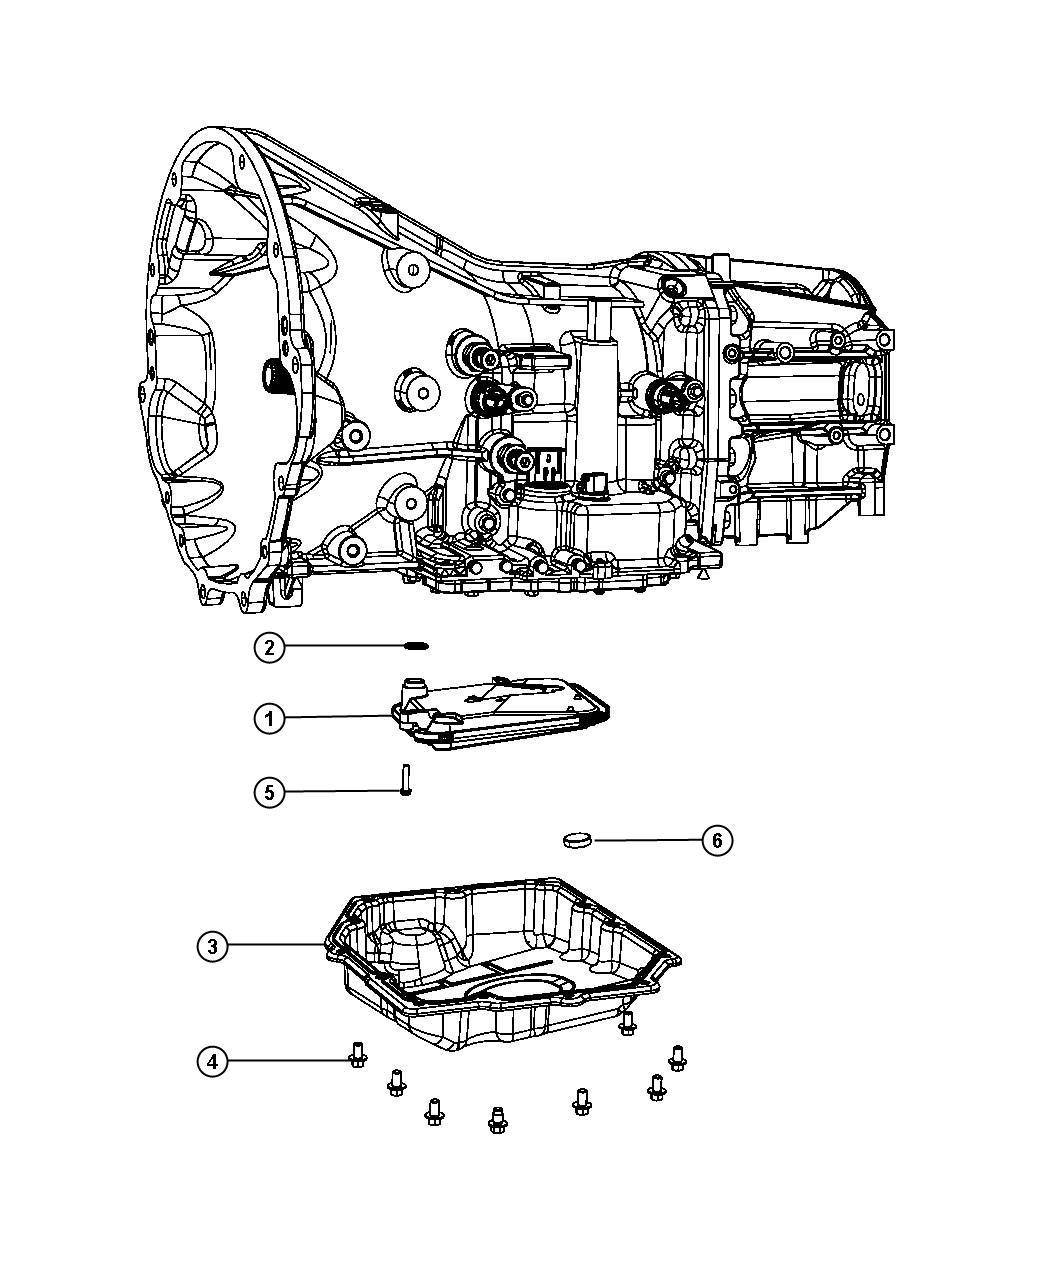 Dodge Caliber Filter Kit Transmission Oil Use Only With